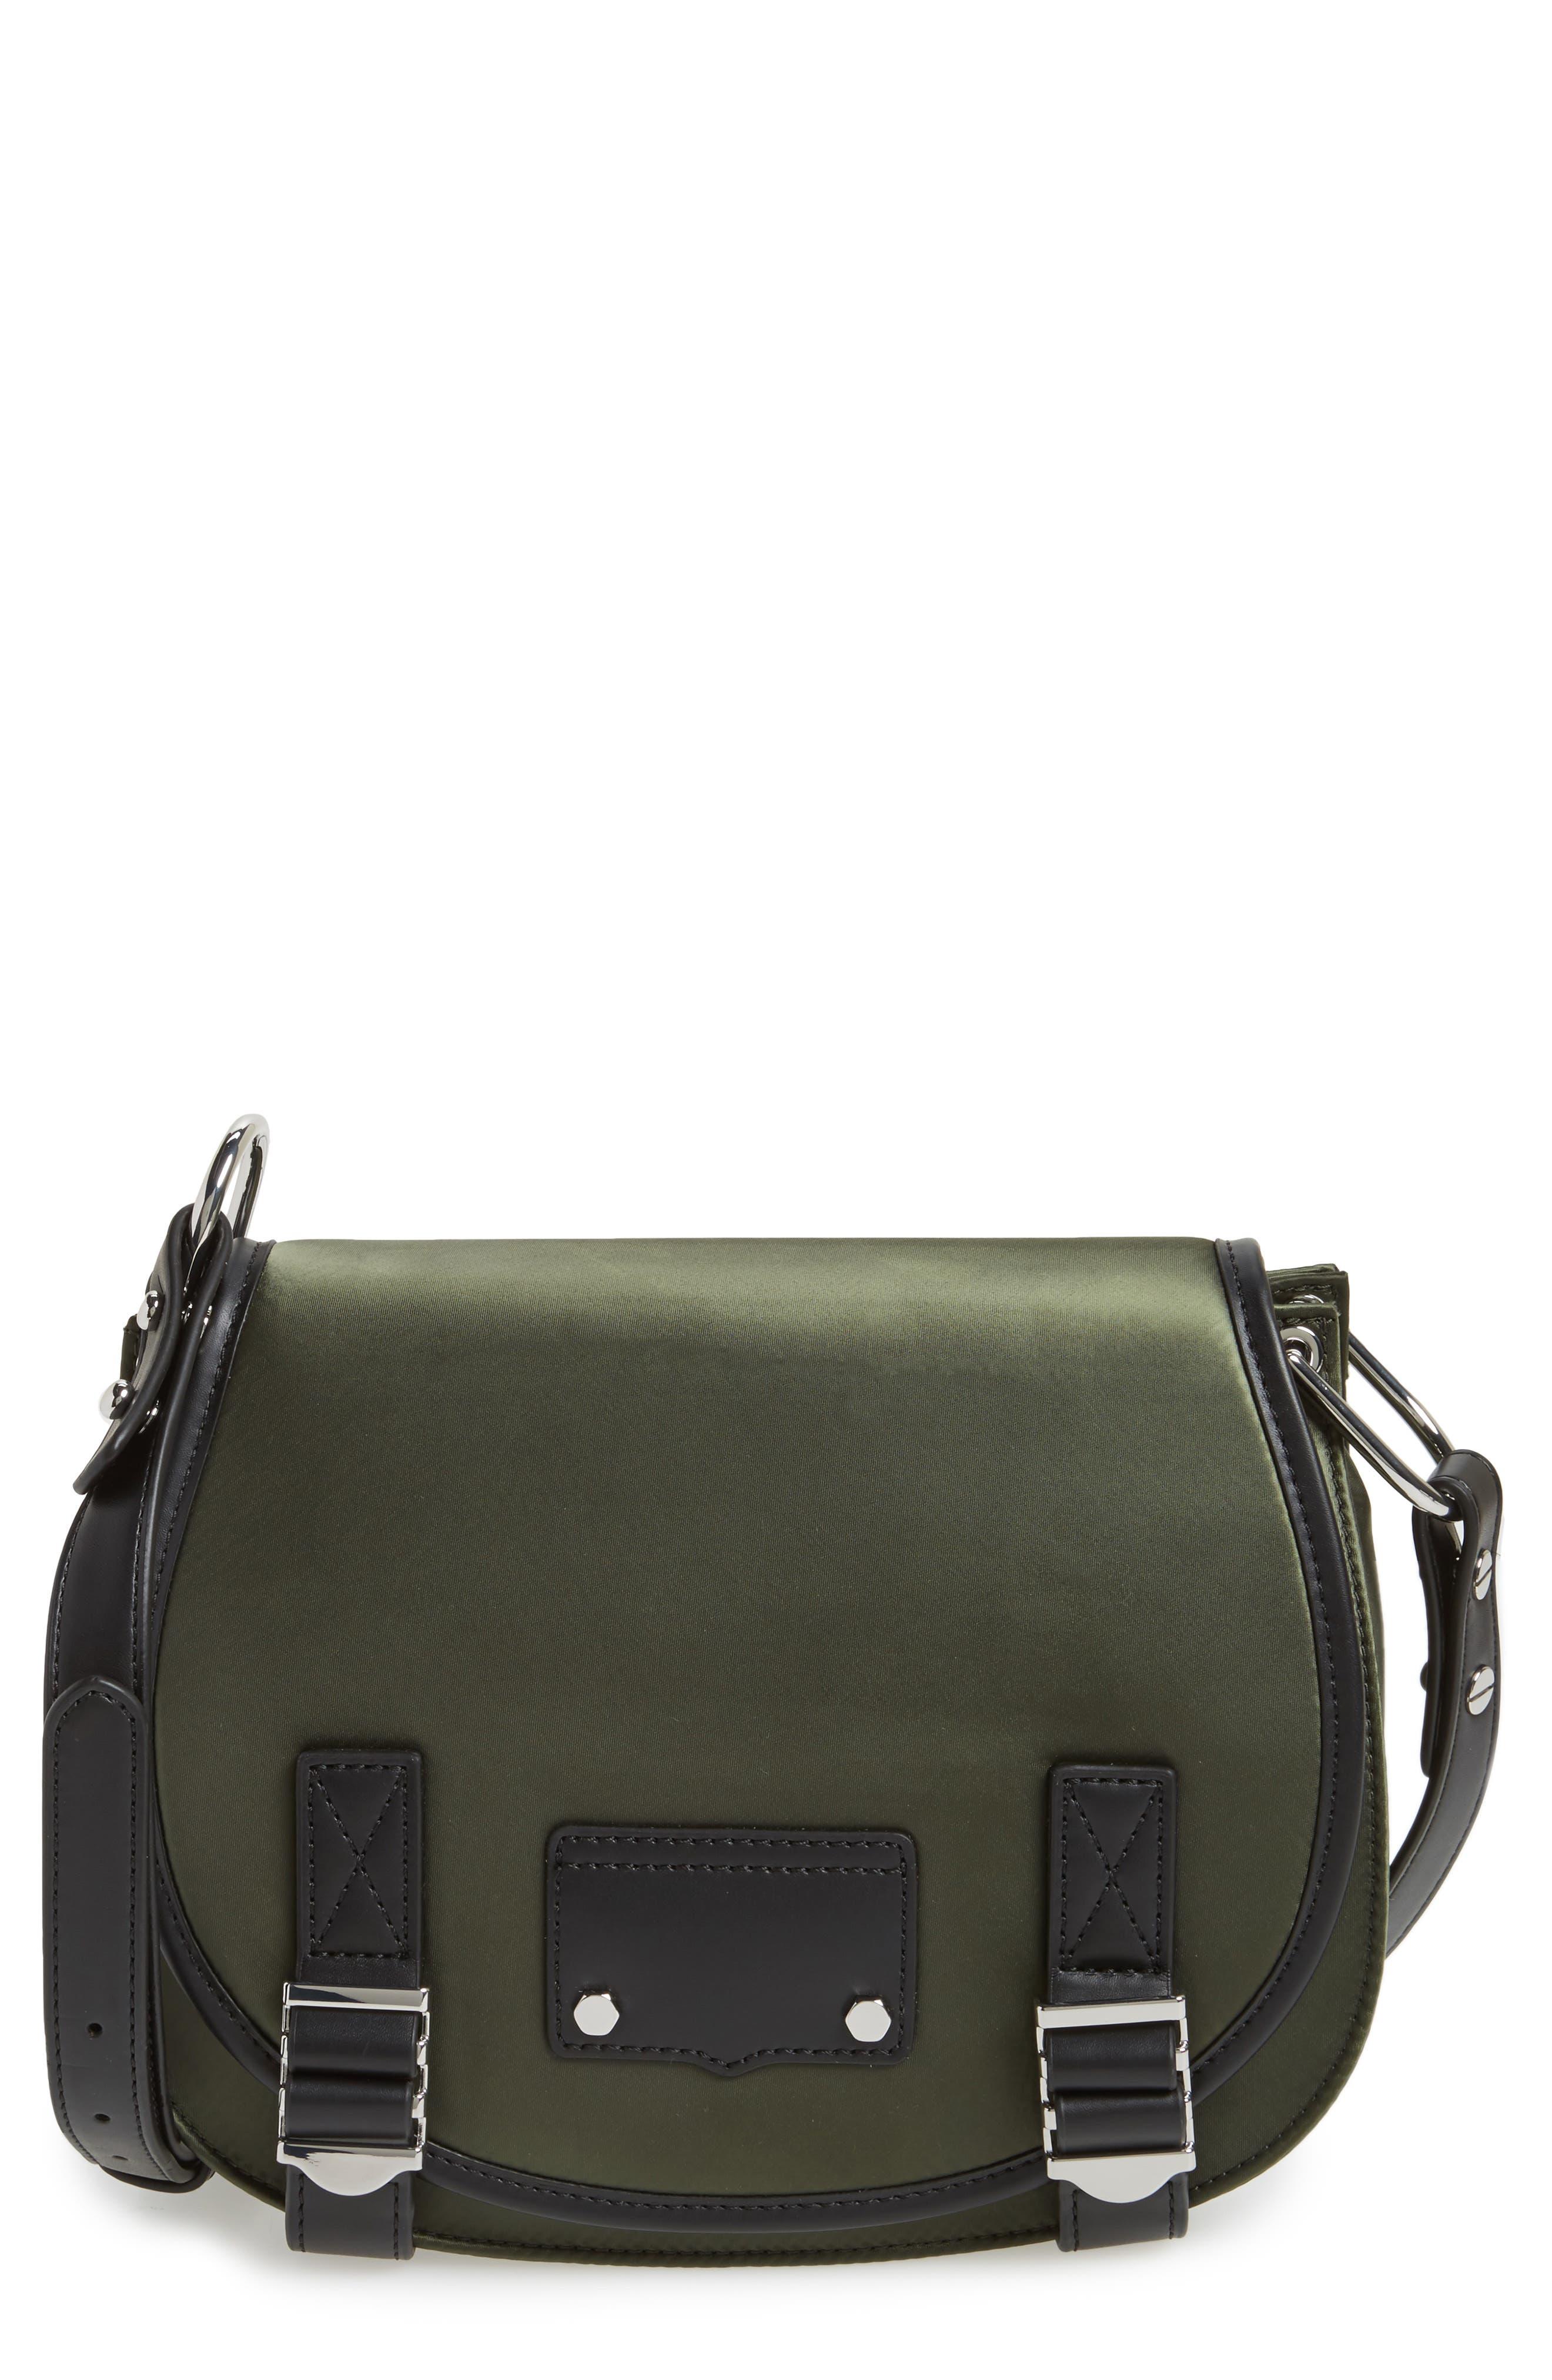 Alternate Image 1 Selected - Rebecca Minkoff Military Satin Nylon Saddle Bag